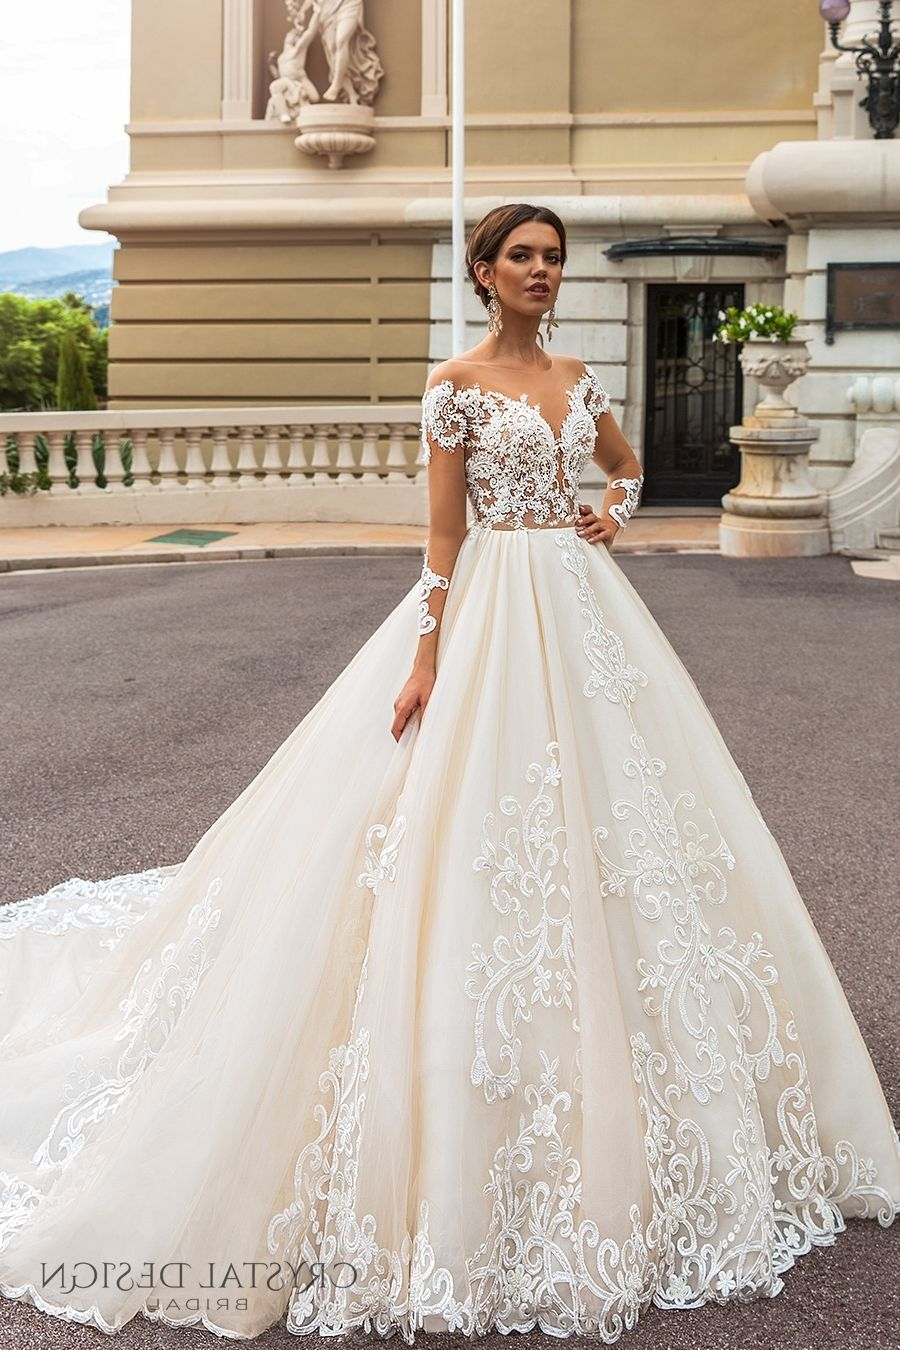 Woodland Princess Wedding Dress | Wedding Dress | Pinterest ...